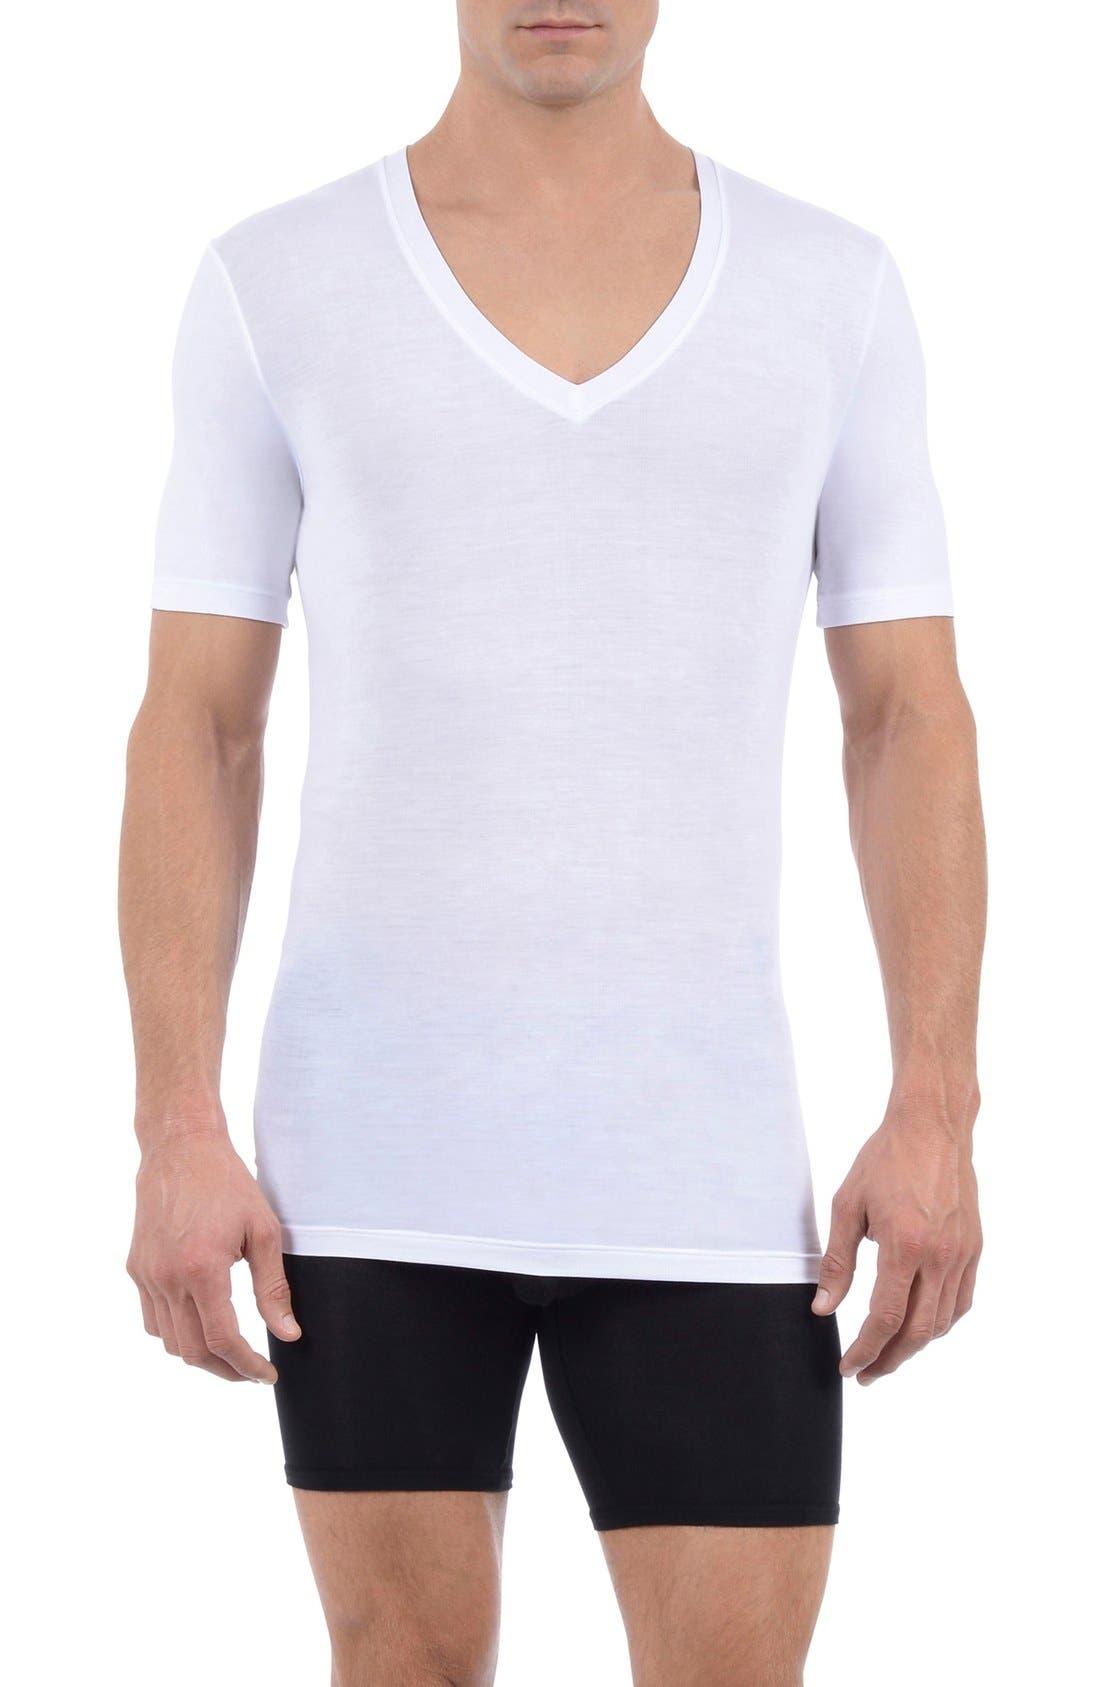 Tommy John 'Cool Cotton' Deep V-Neck Undershirt